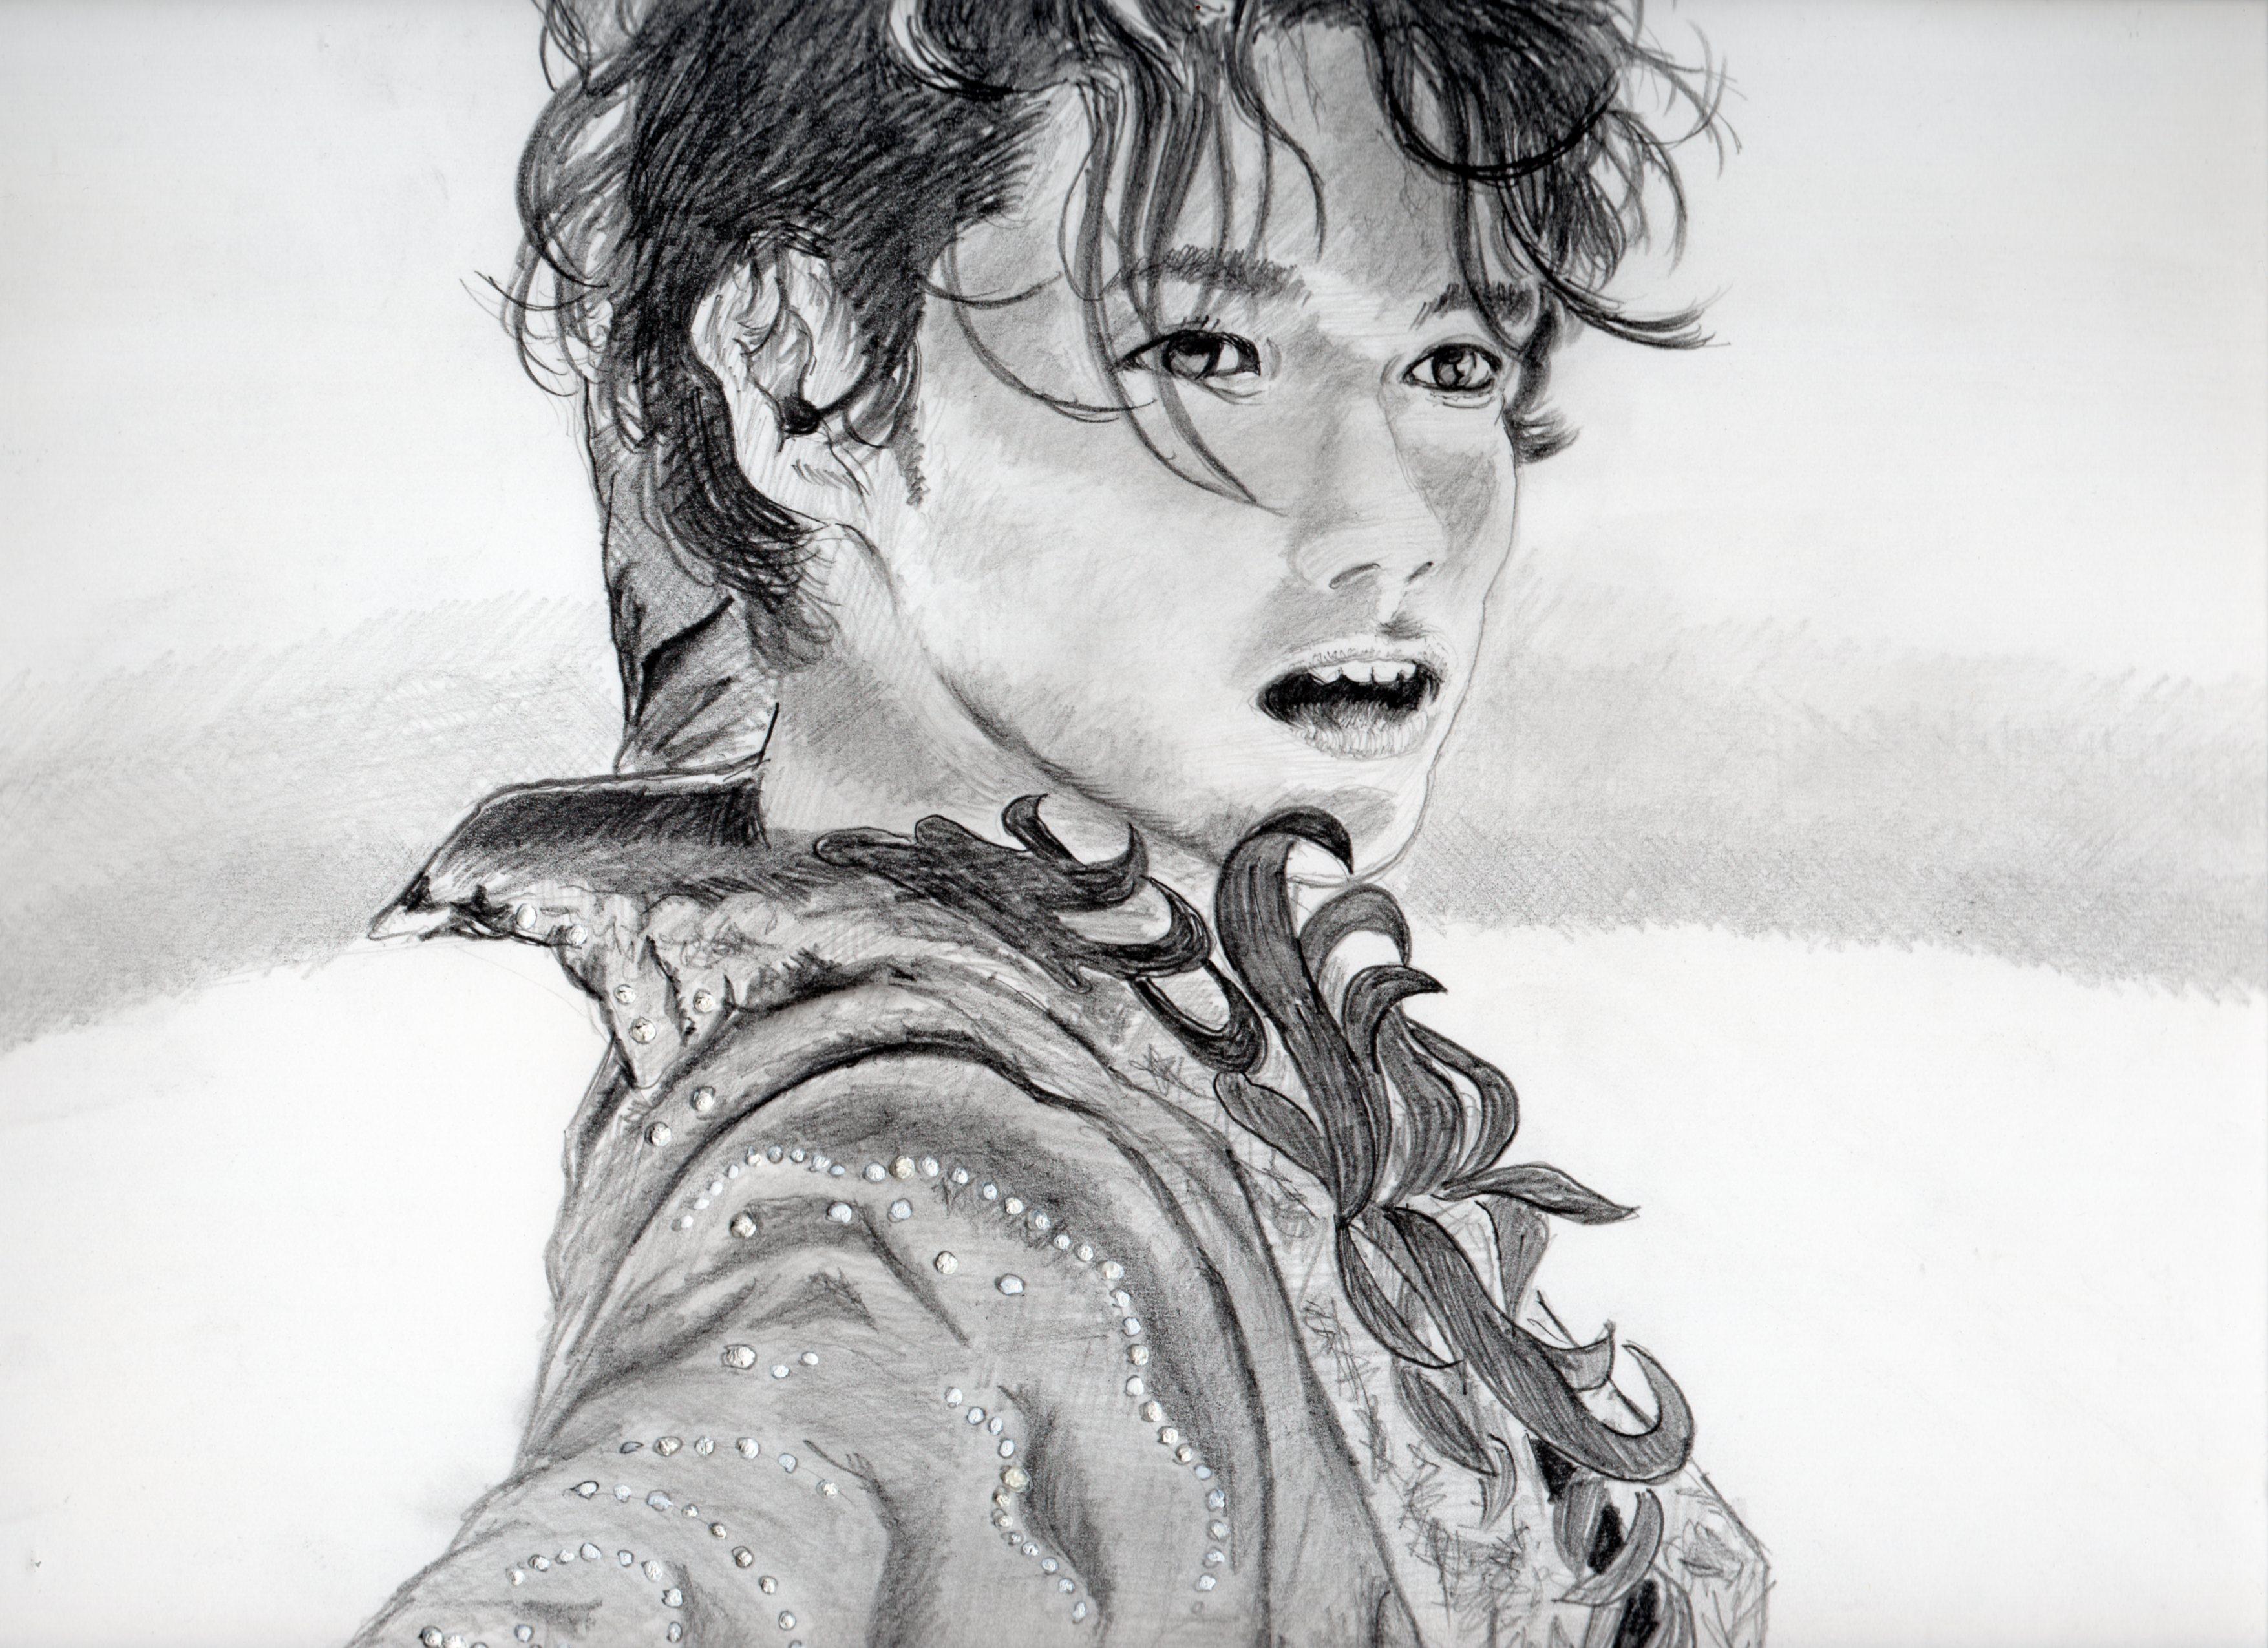 高橋大輔の鉛筆画似顔絵